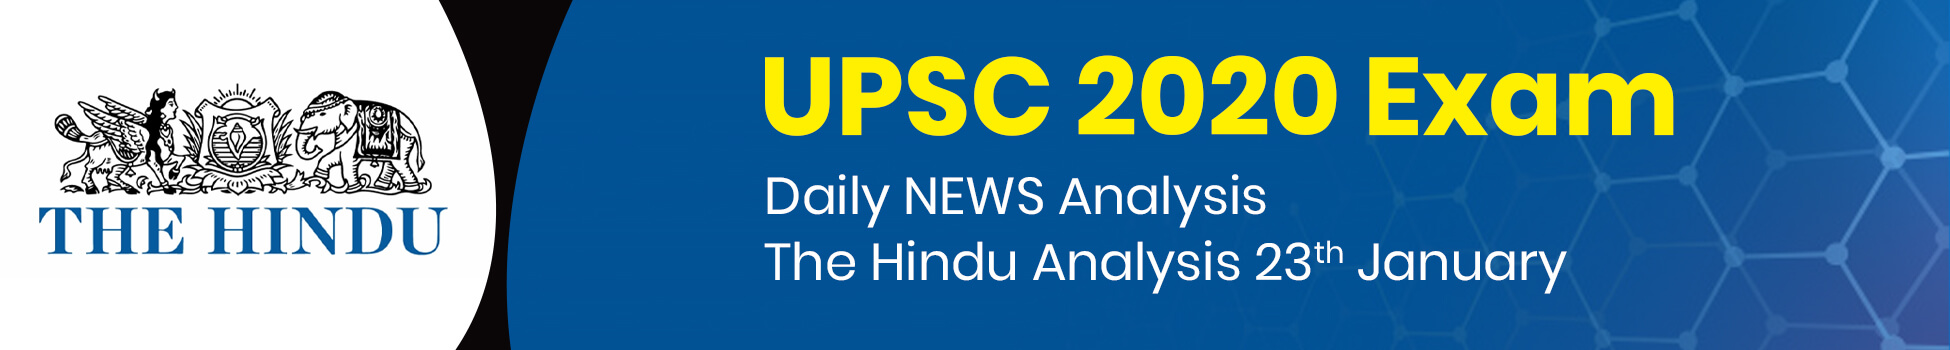 Daily NEWS Analysis | The Hindu Analysis 23rd January | UPSC 2020 Exam